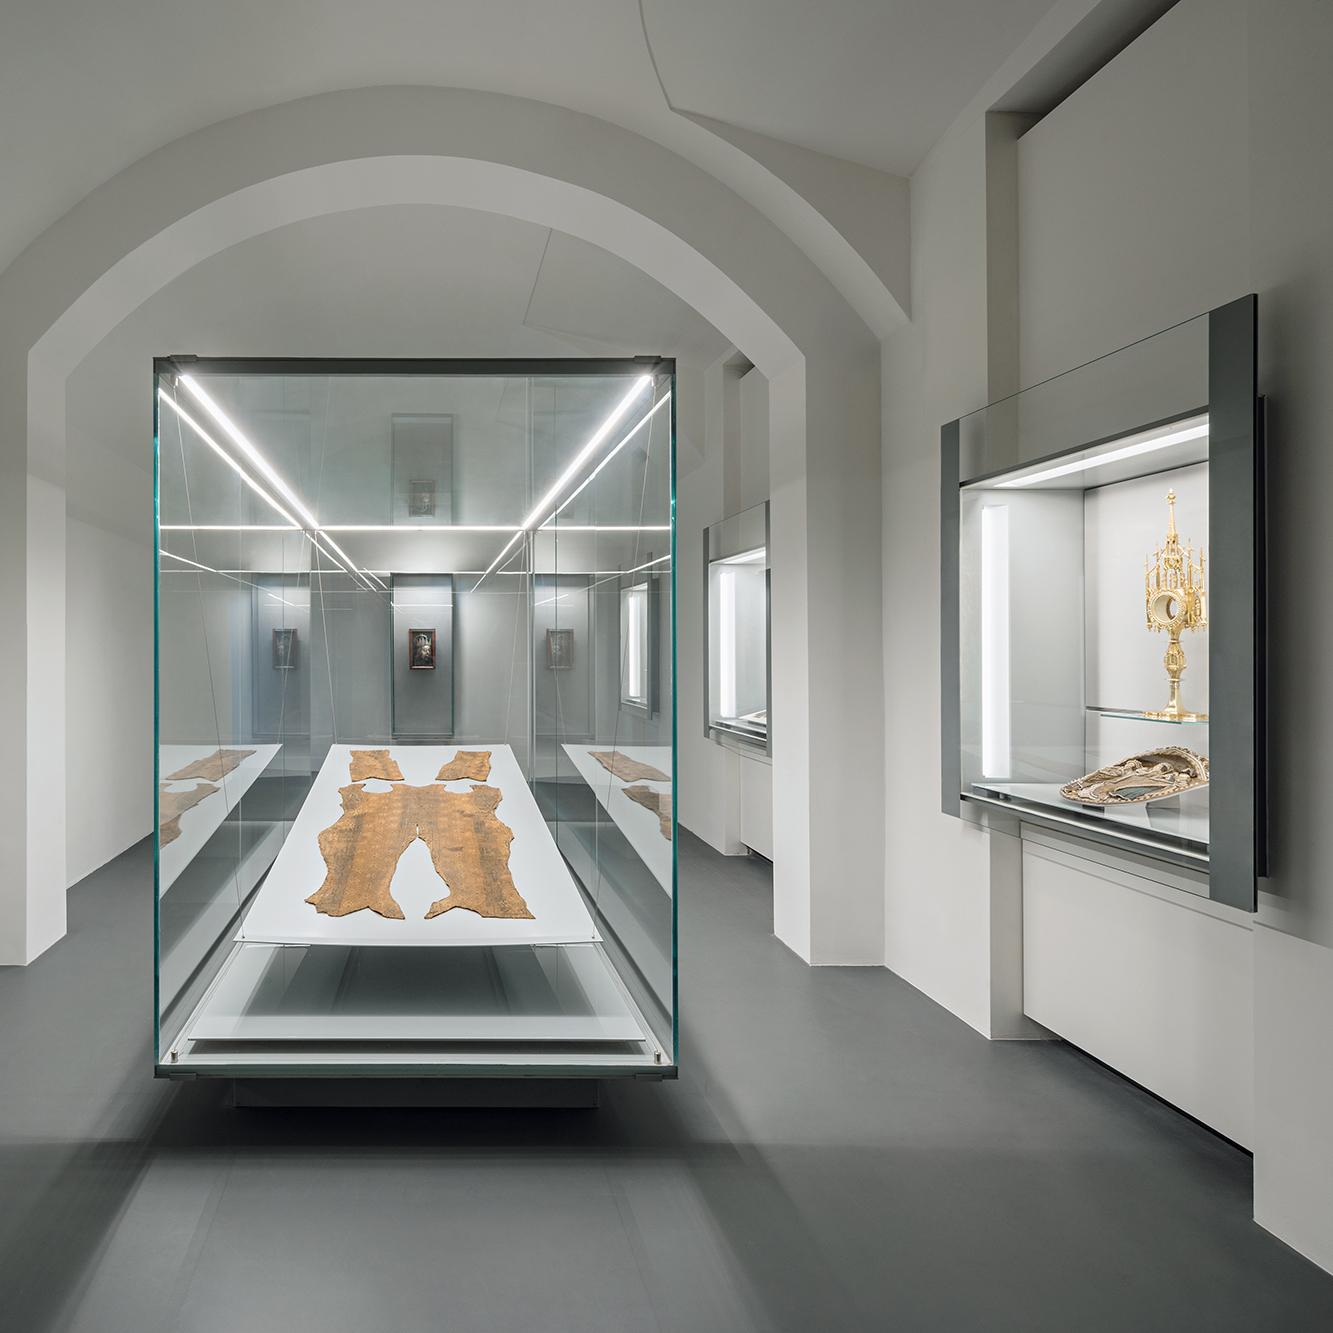 Hertha Hurnaus / Dom Museum Wien